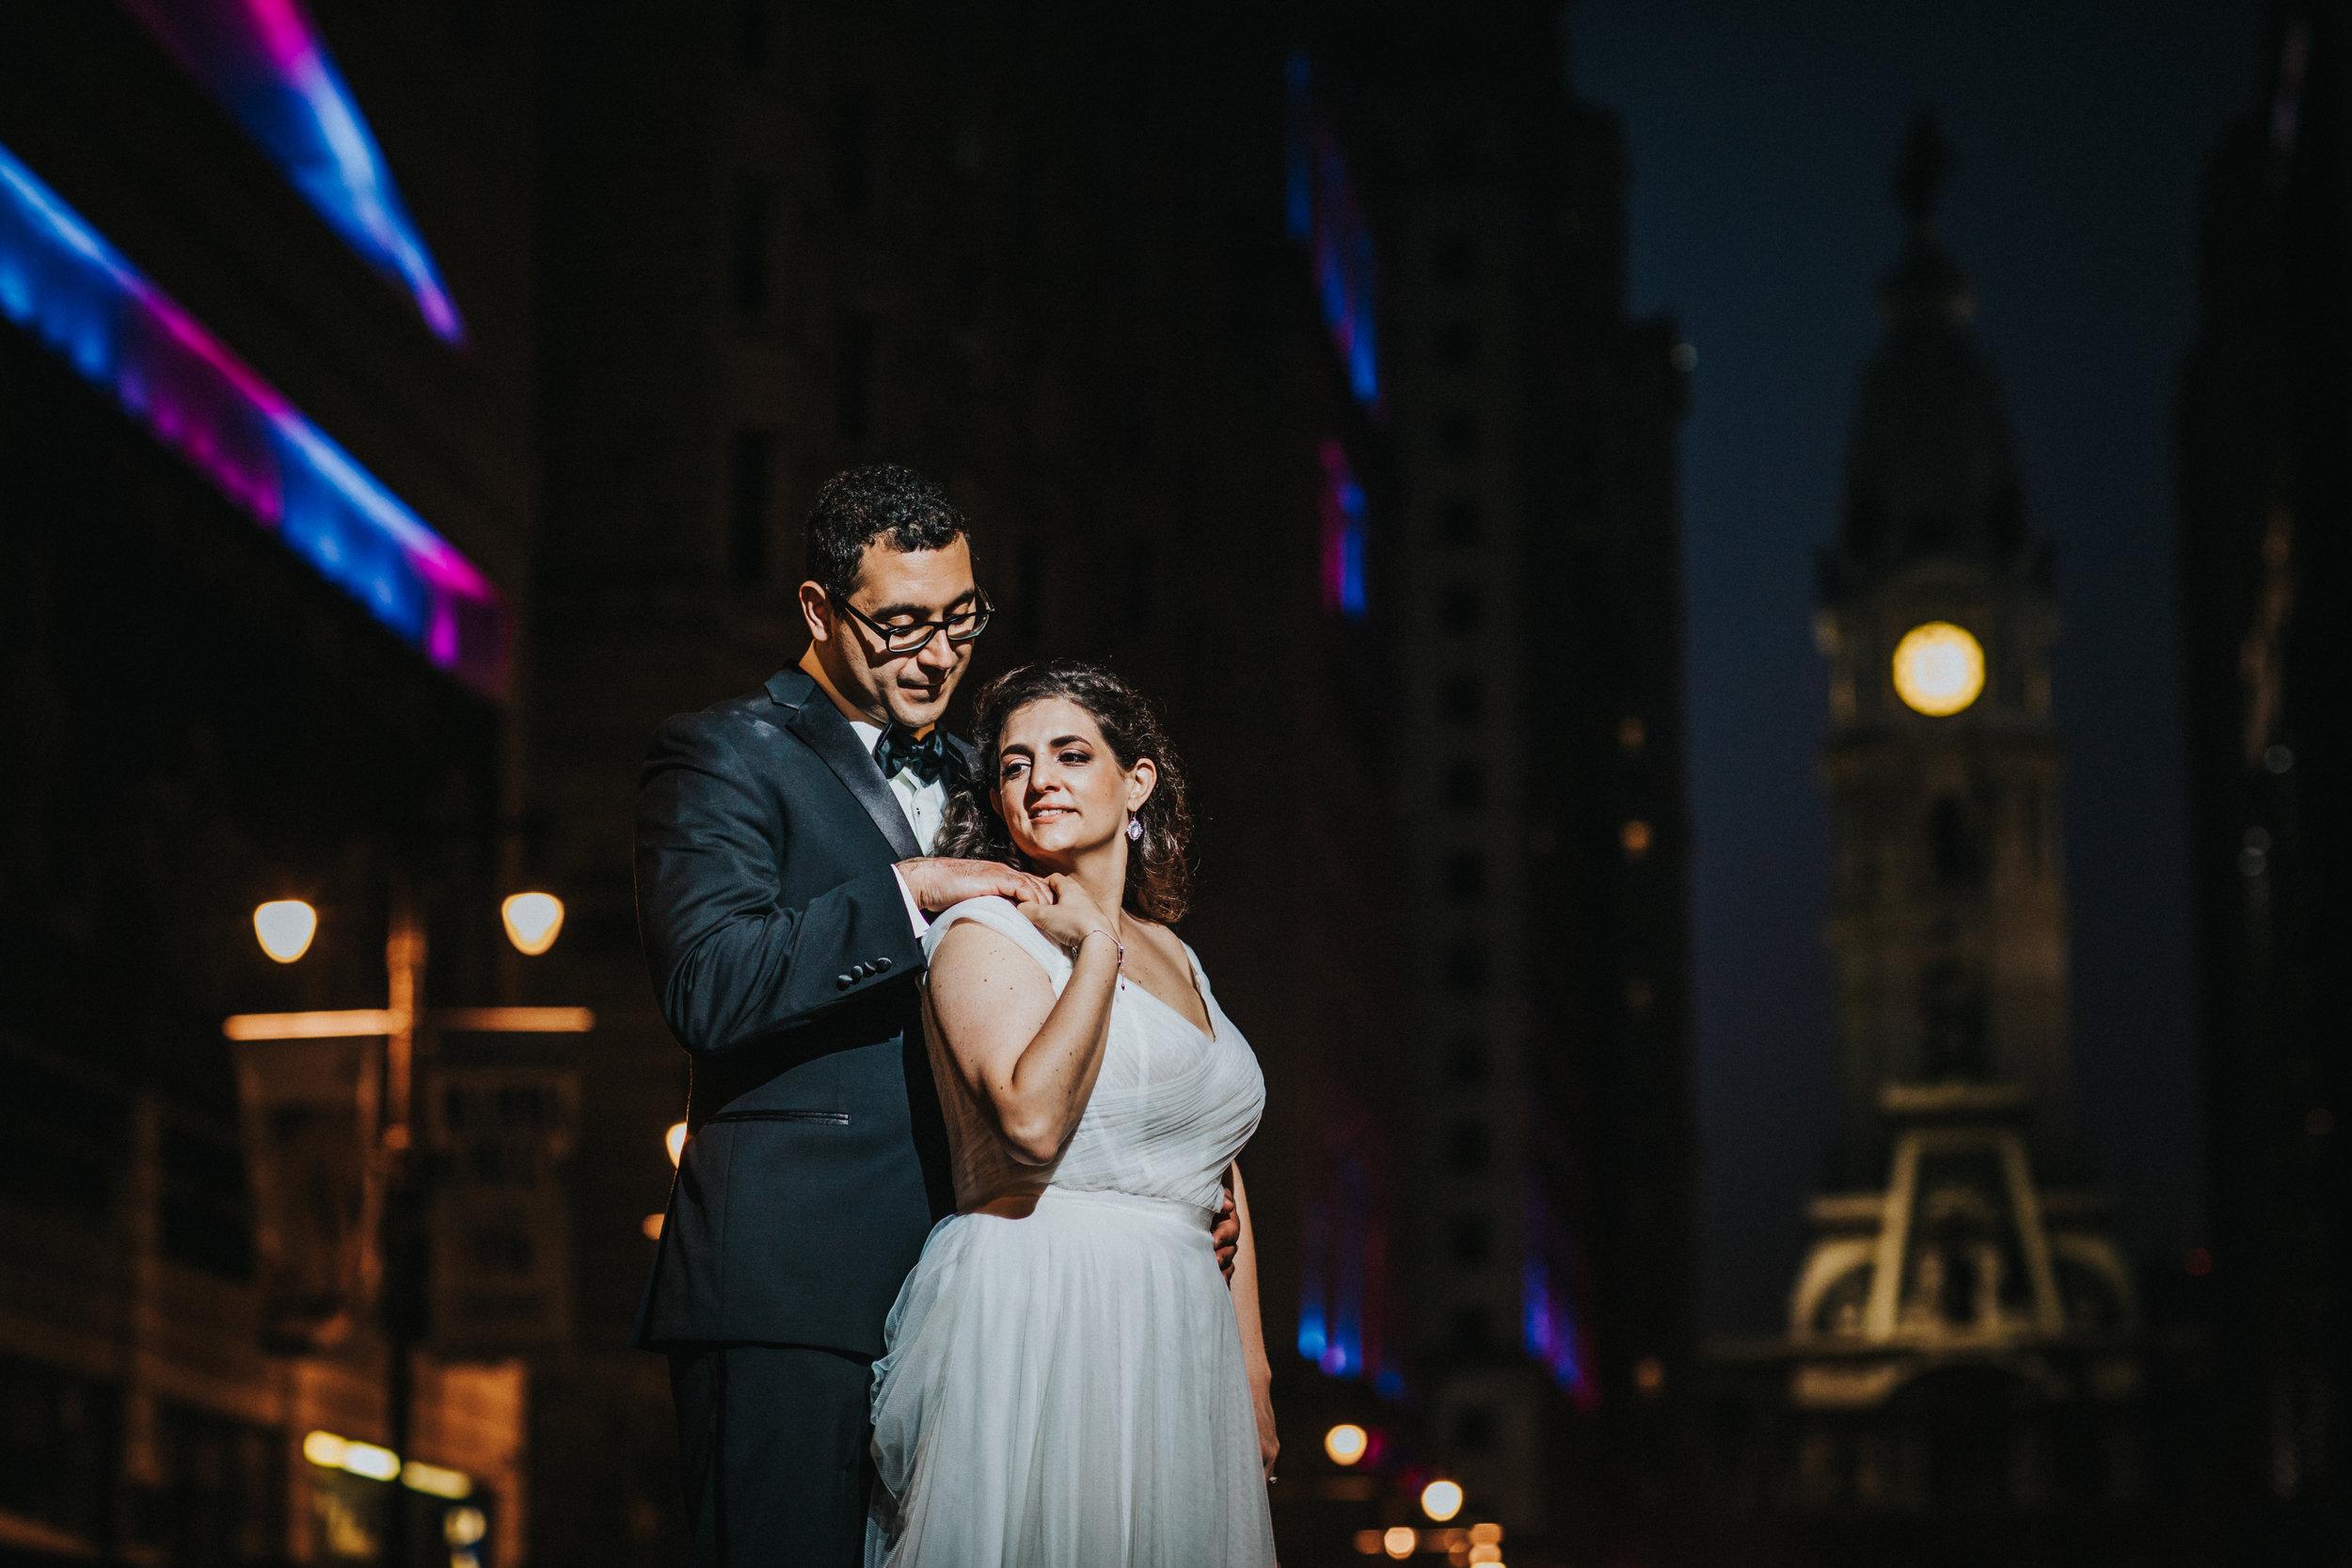 JennaLynnPhotography-NJWeddingPhotographer-Philadelphia-Wedding-ArtsBallroom-BridalParty-95.jpg